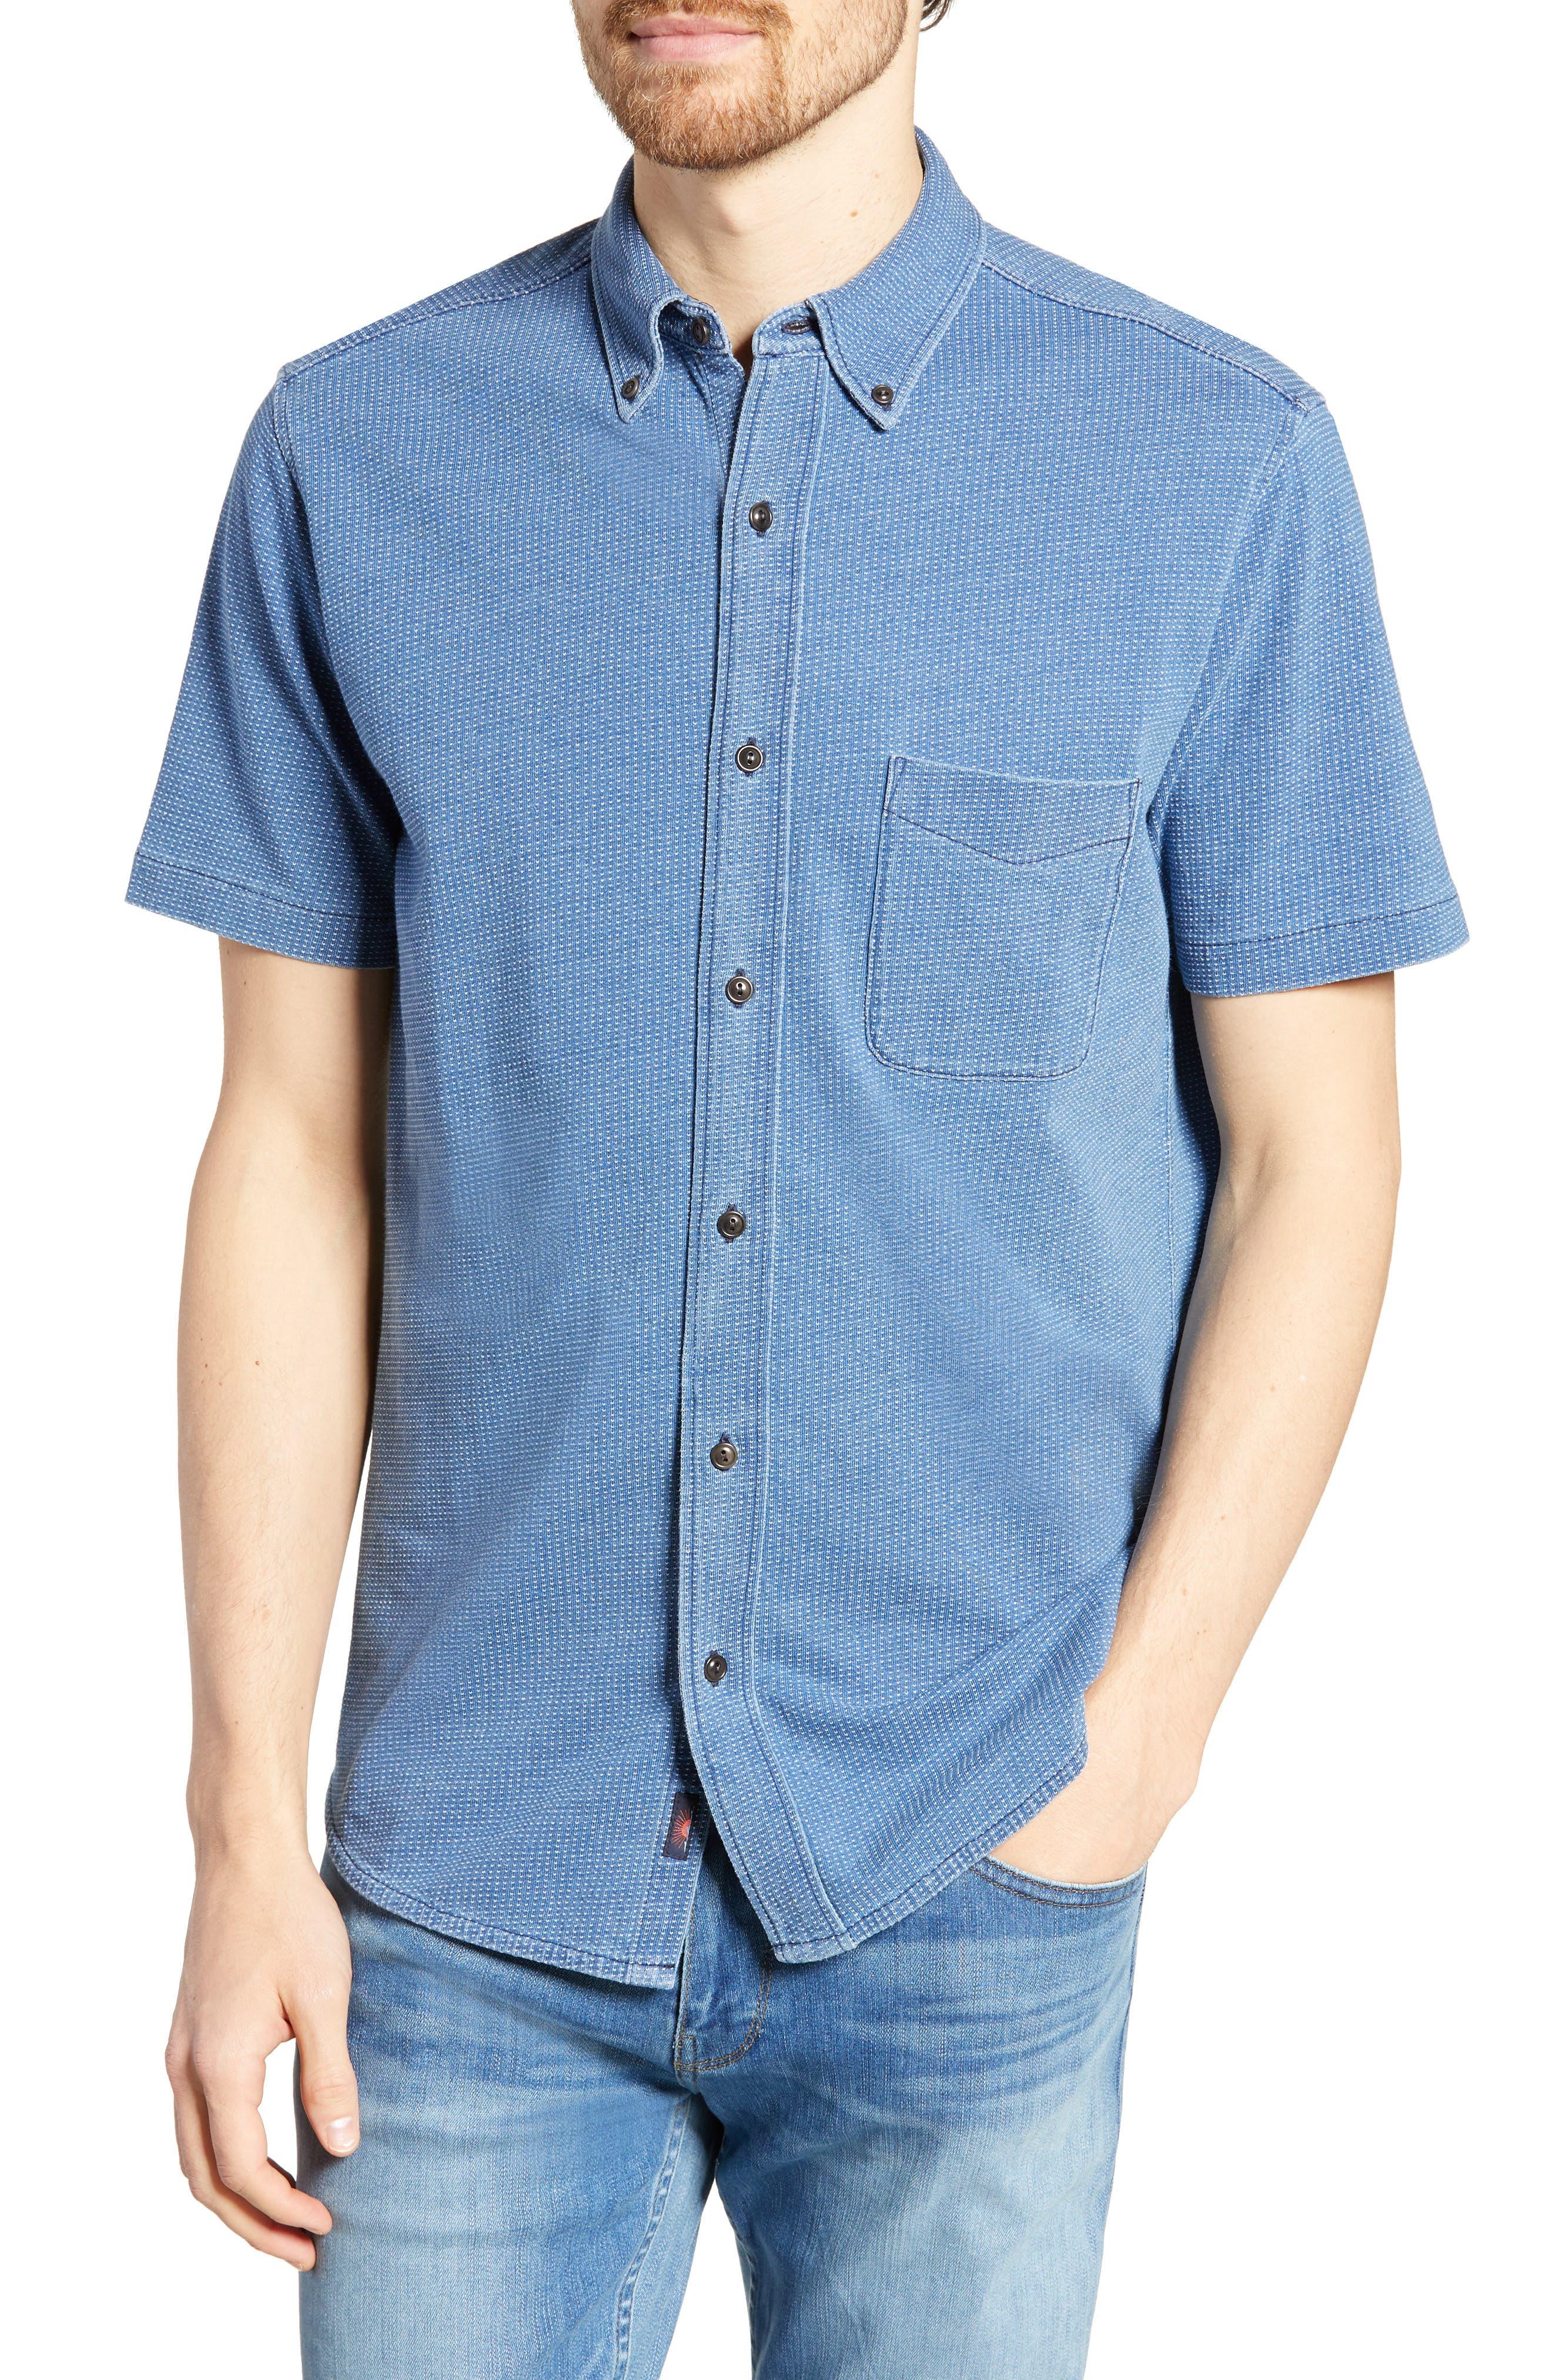 Faherty Pacific Regular Fit Sport Shirt, Blue